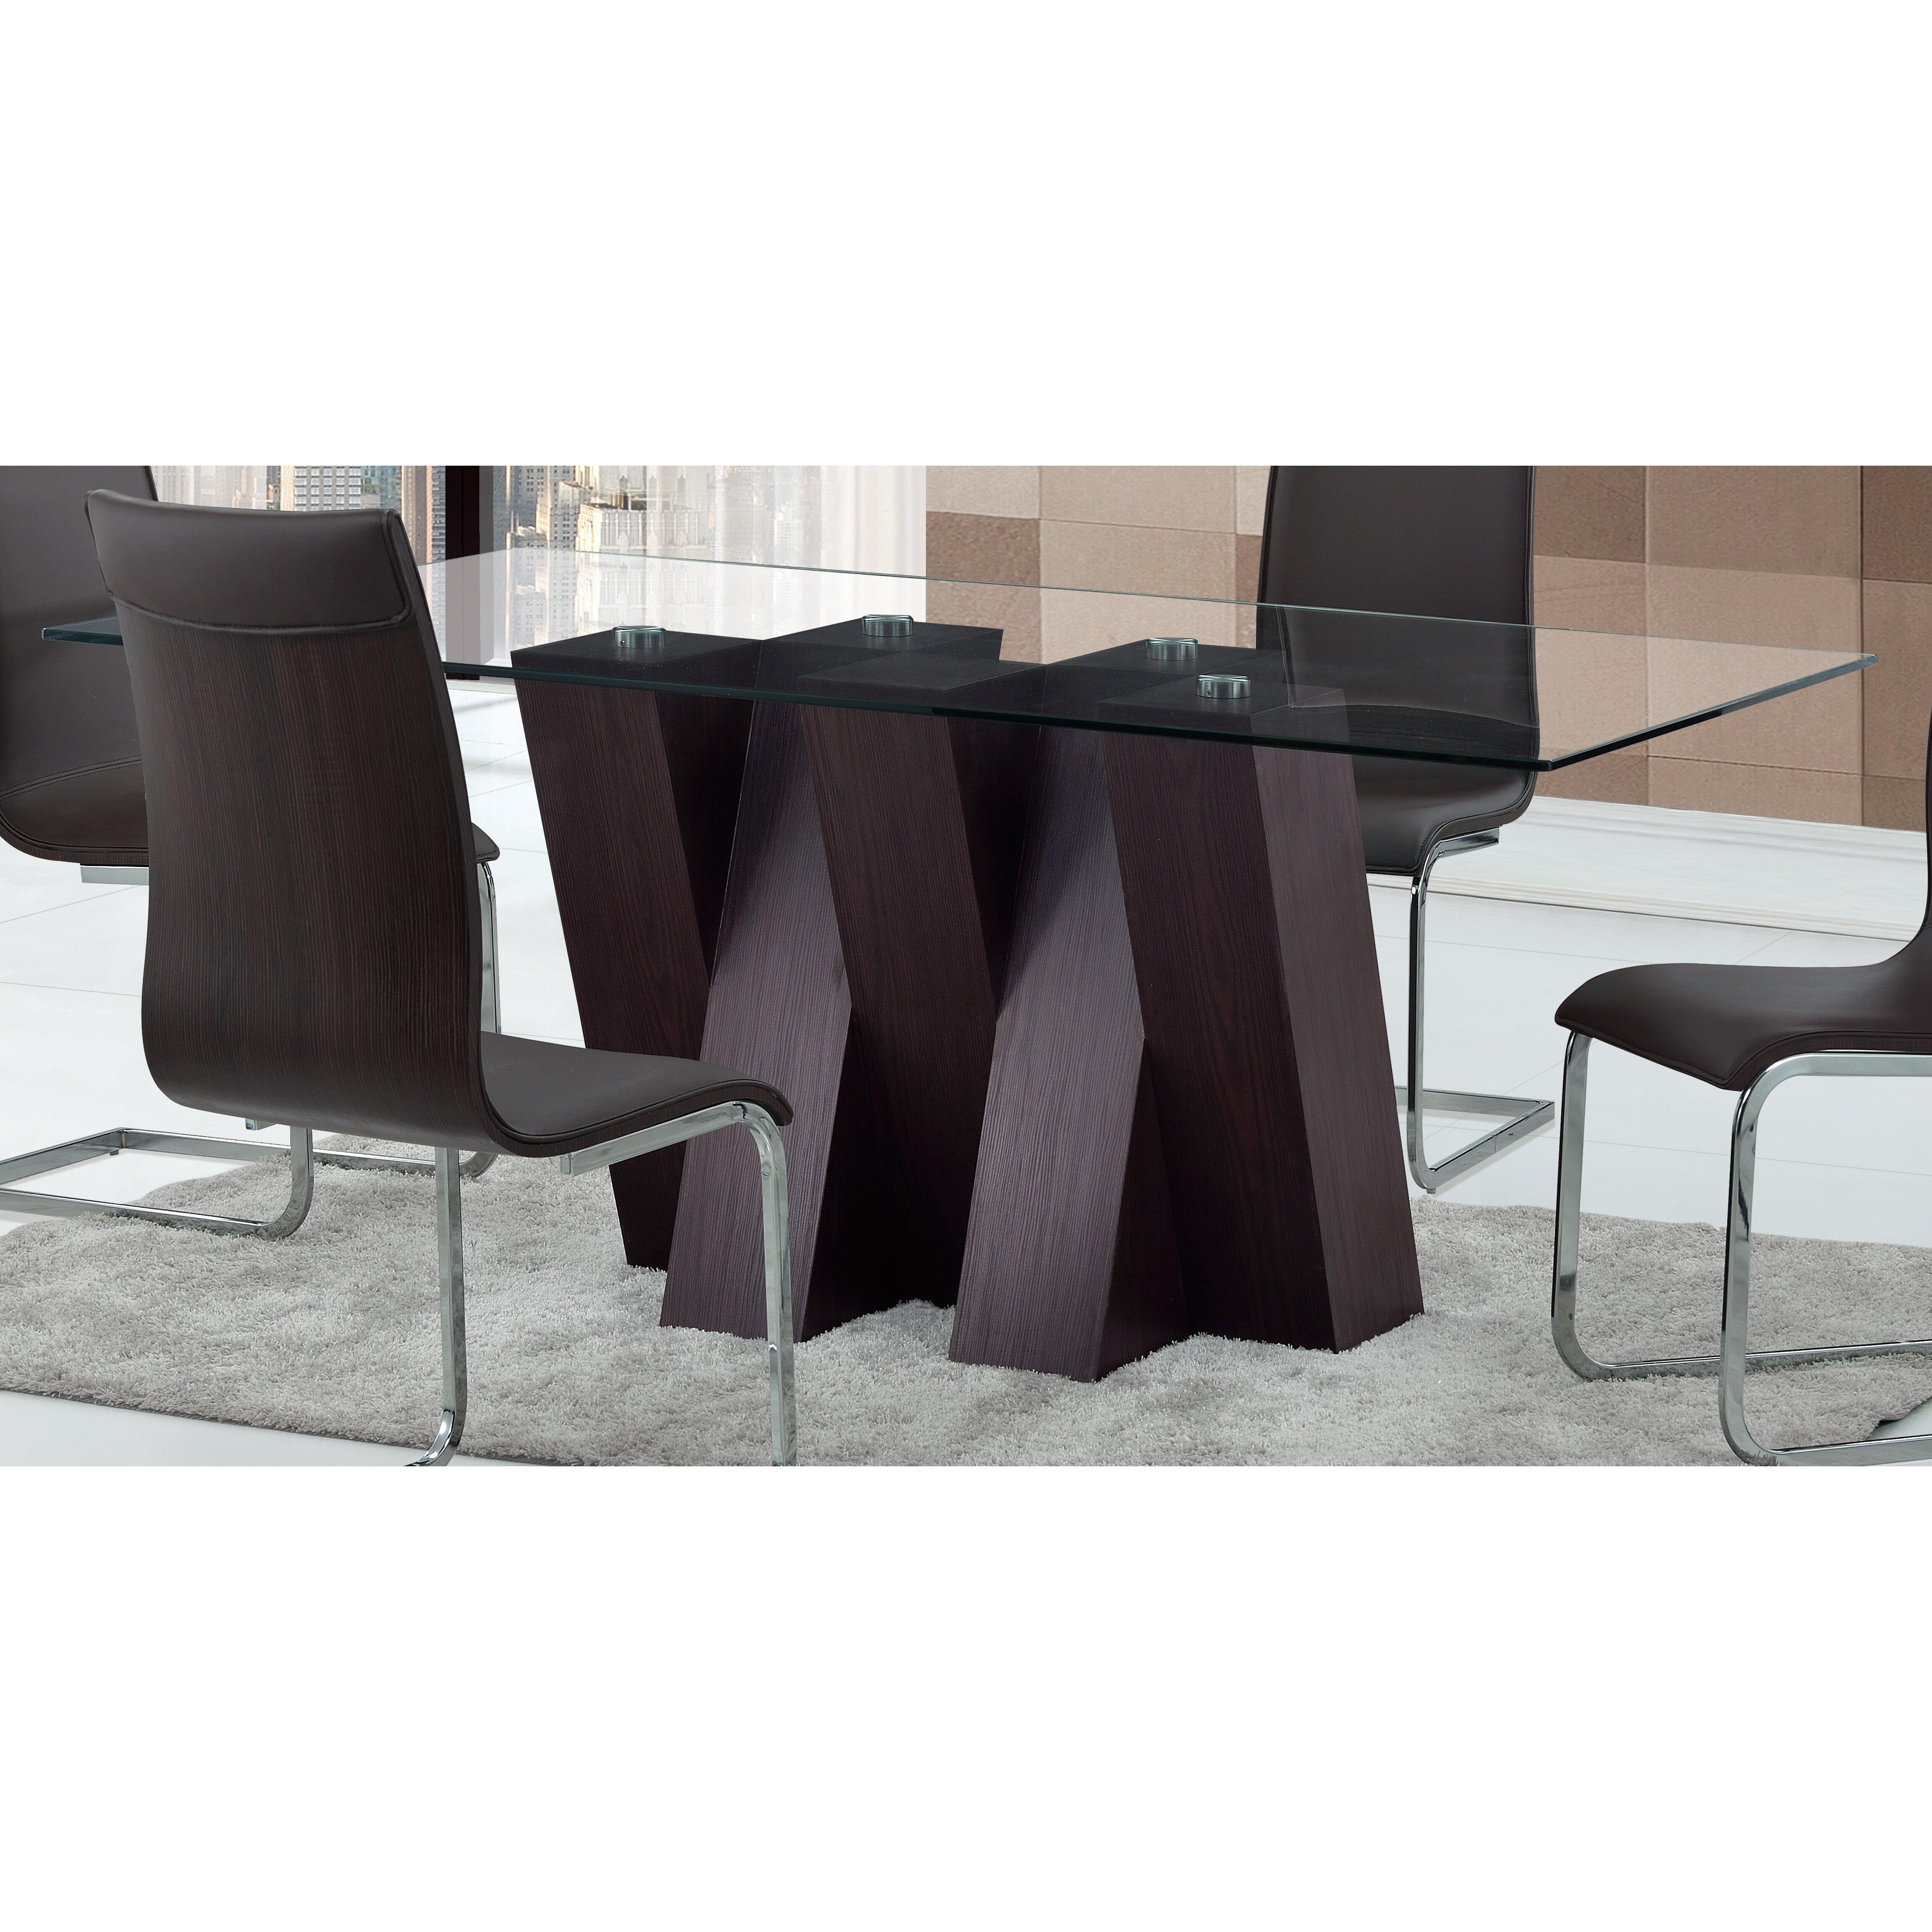 Global furniture usa dining table wayfair for Furniture usa